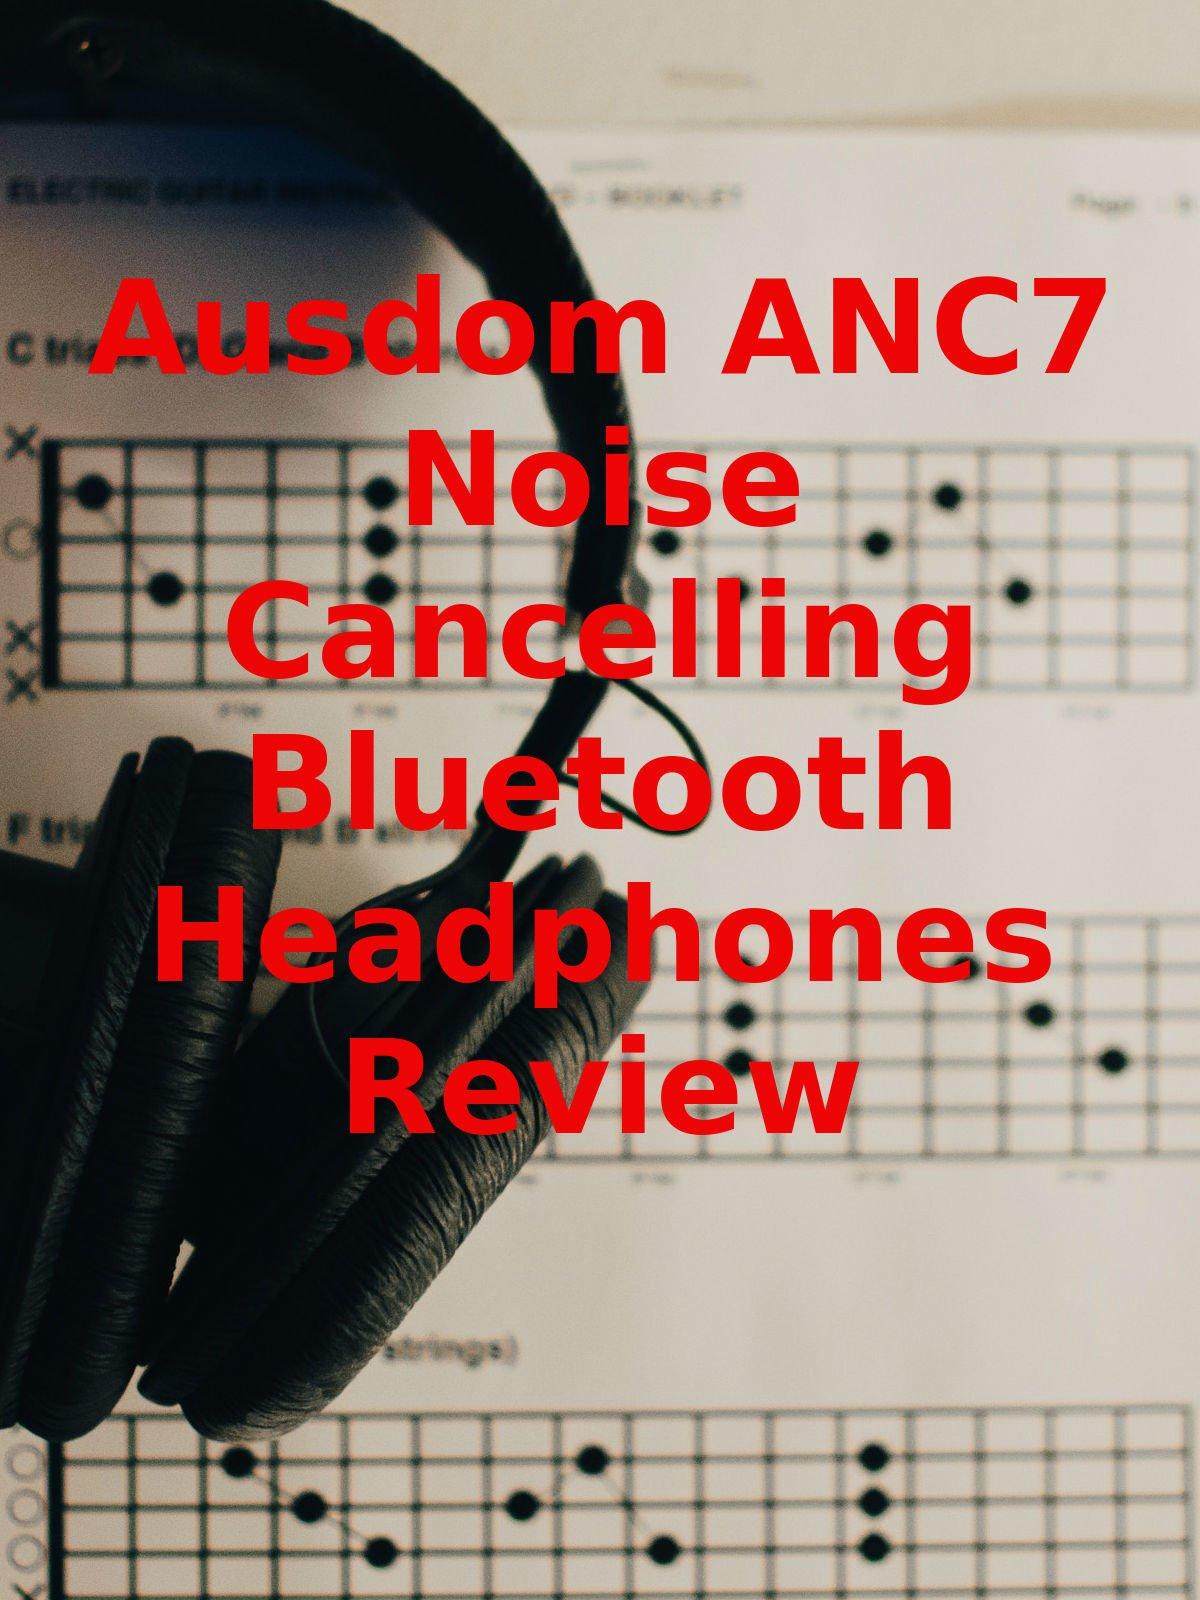 Review: Ausdom Anc7 Noise Cancelling Bluetooth Headphones Review